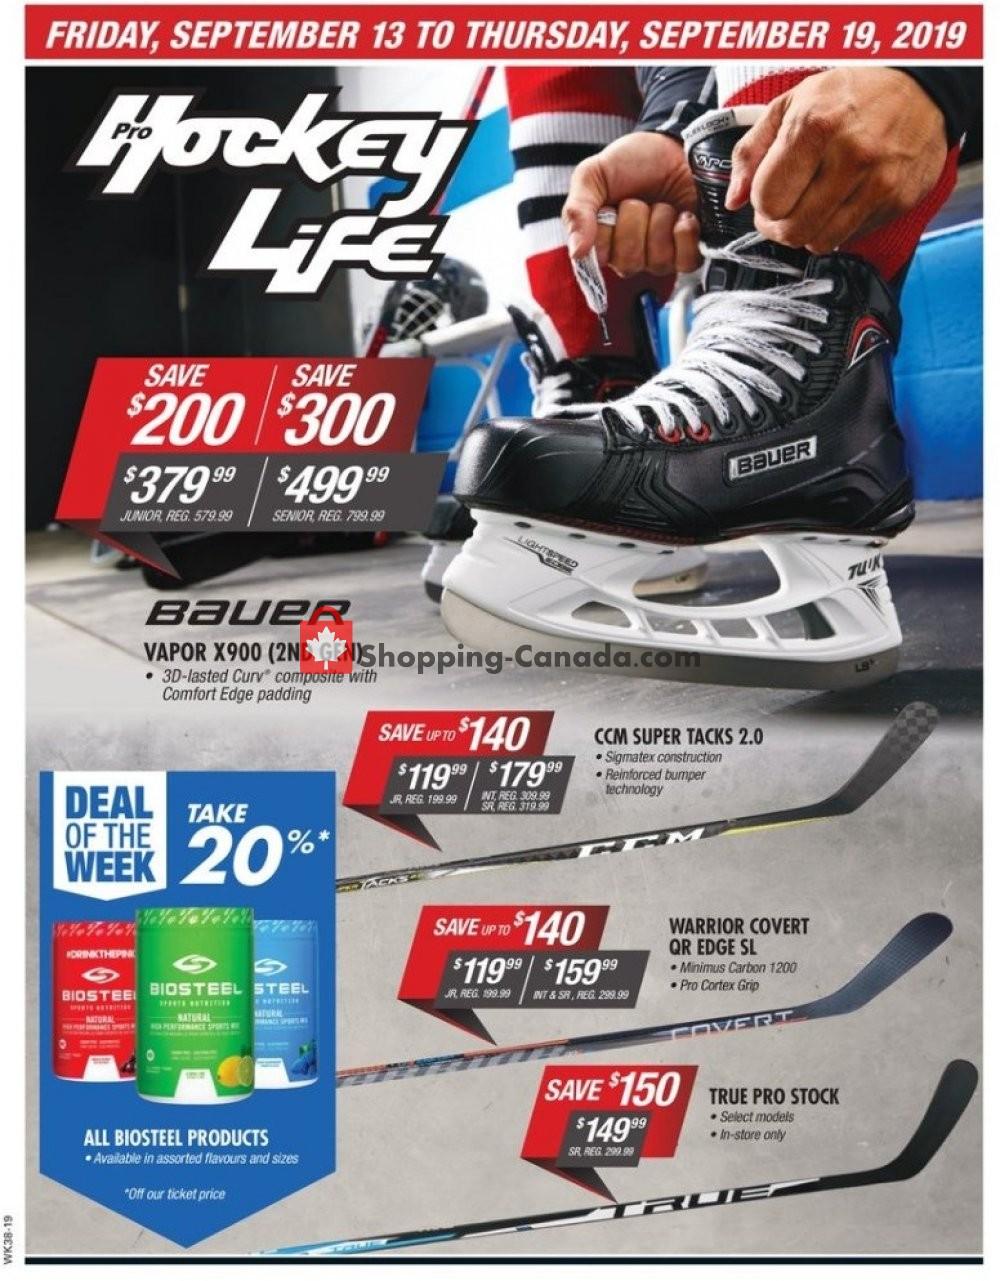 Flyer Pro Hockey Life Canada - from Friday September 13, 2019 to Thursday September 19, 2019